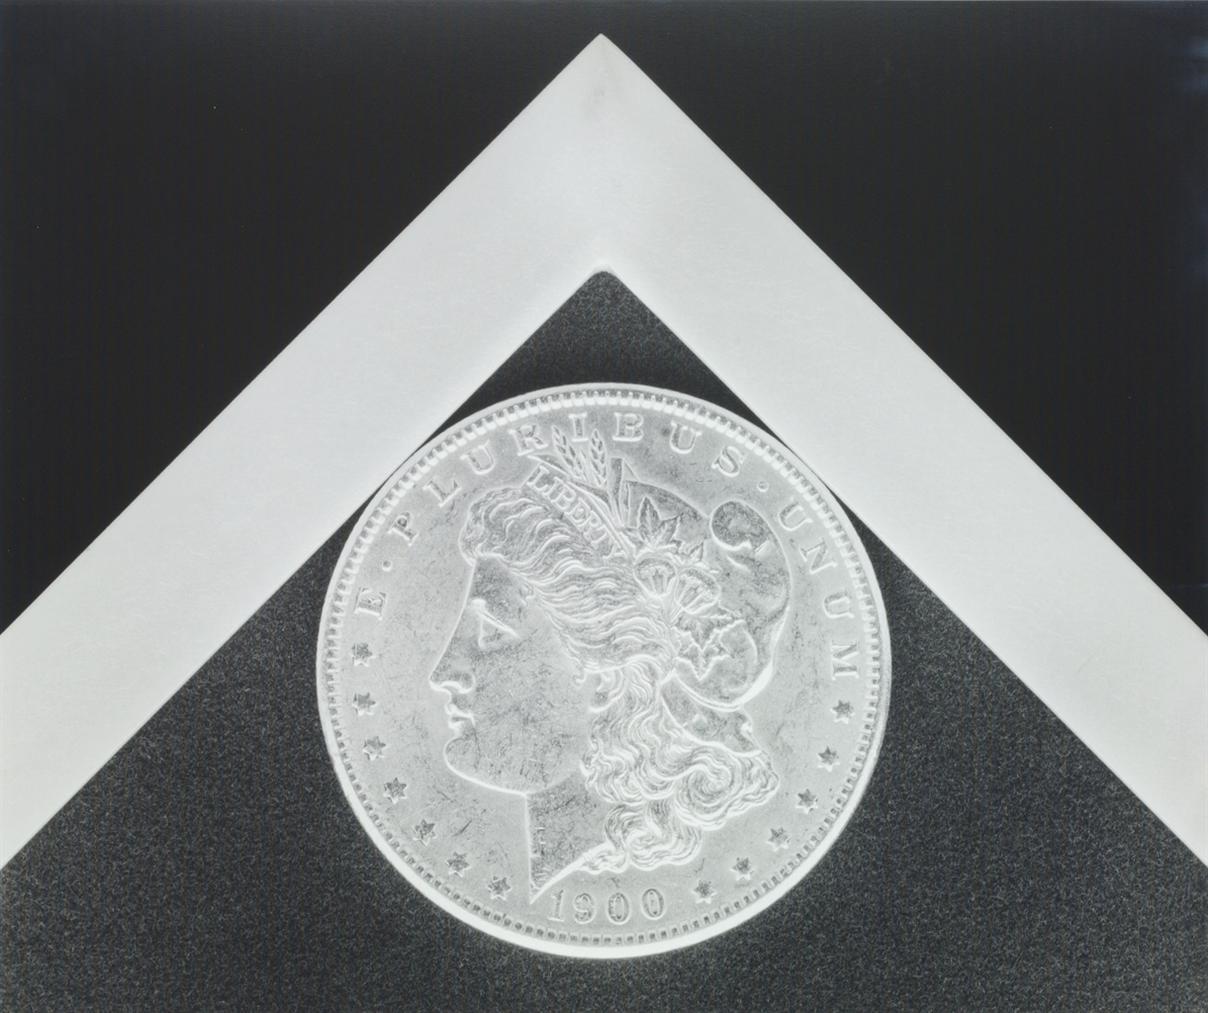 Robert Mapplethorpe-Coin-1988